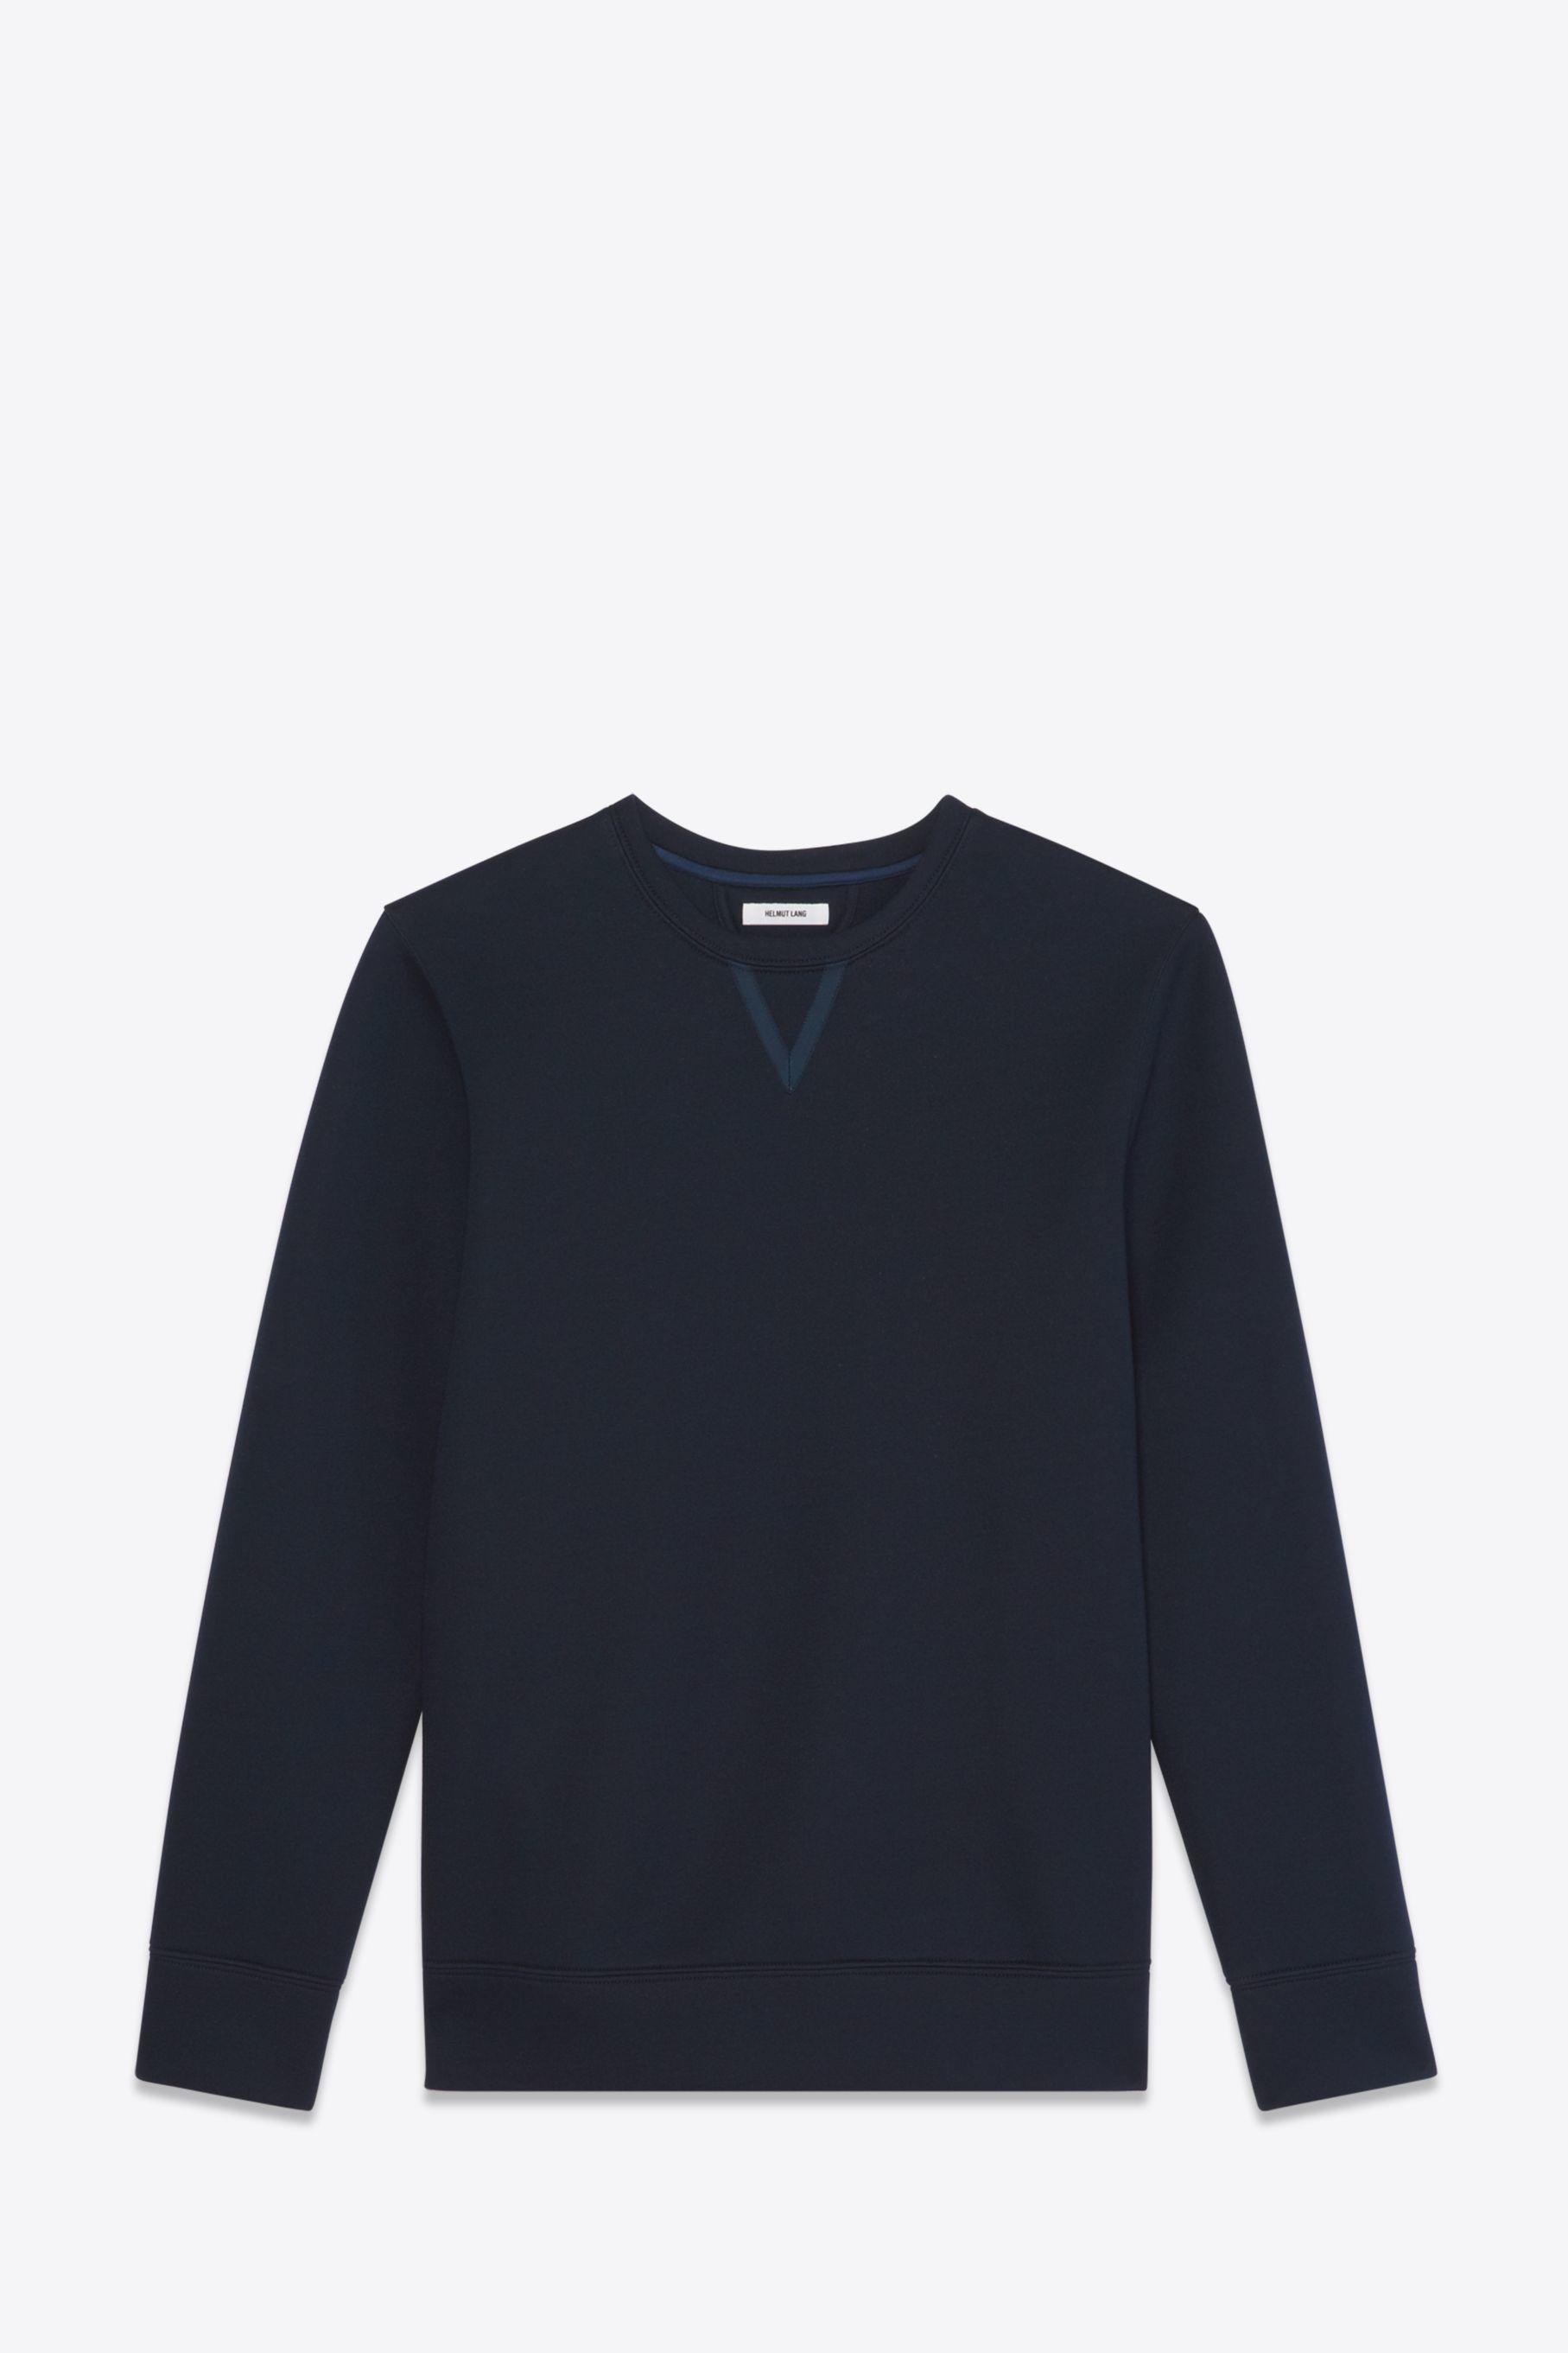 Helmut lang tape sweatshirt in blue for men lyst for Sweatshirt kleid lang